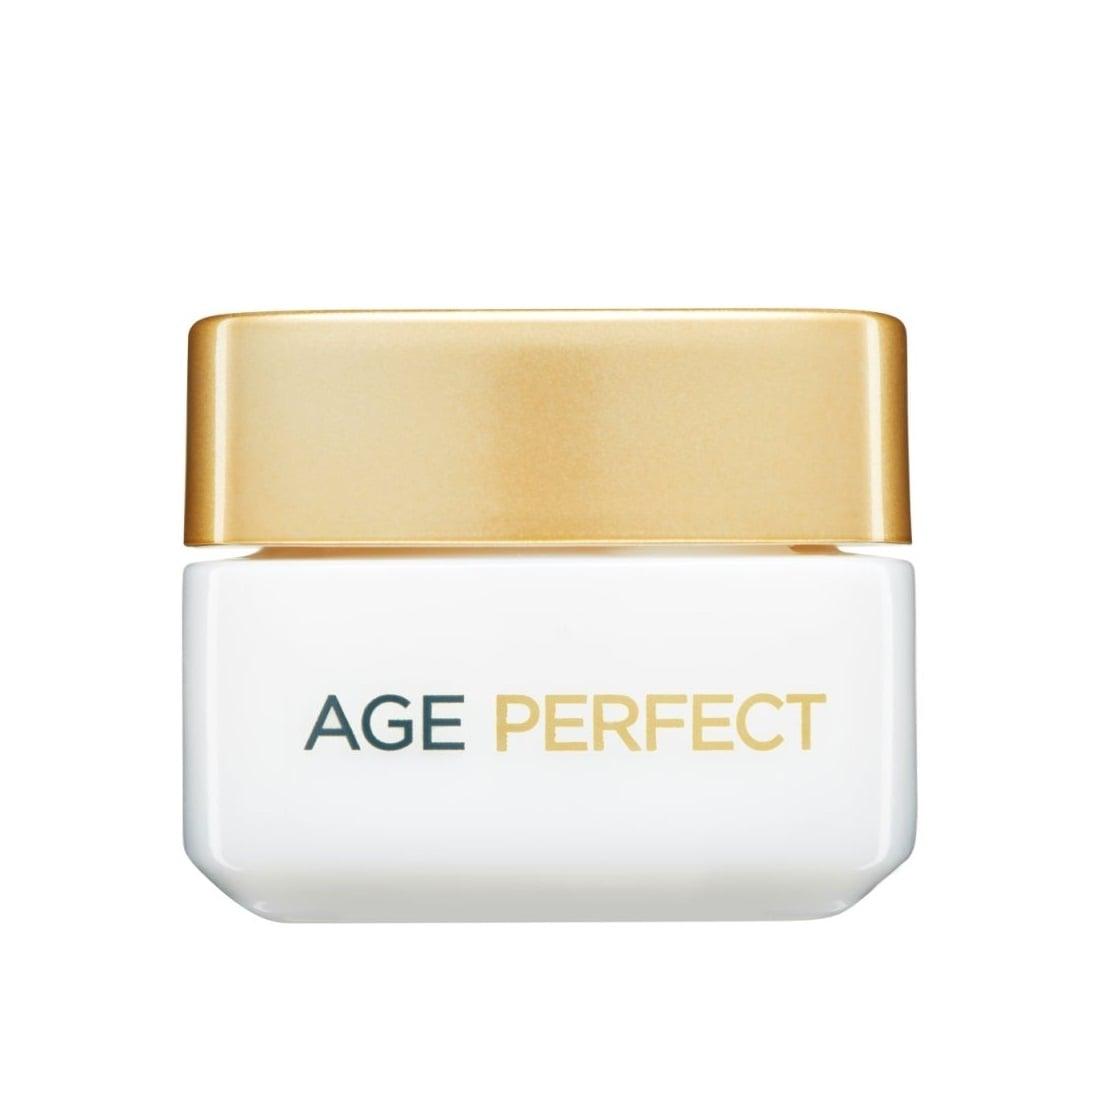 Age Perfect Κυτταρική Ανάπλαση Κρέμα Ματιών 15ml